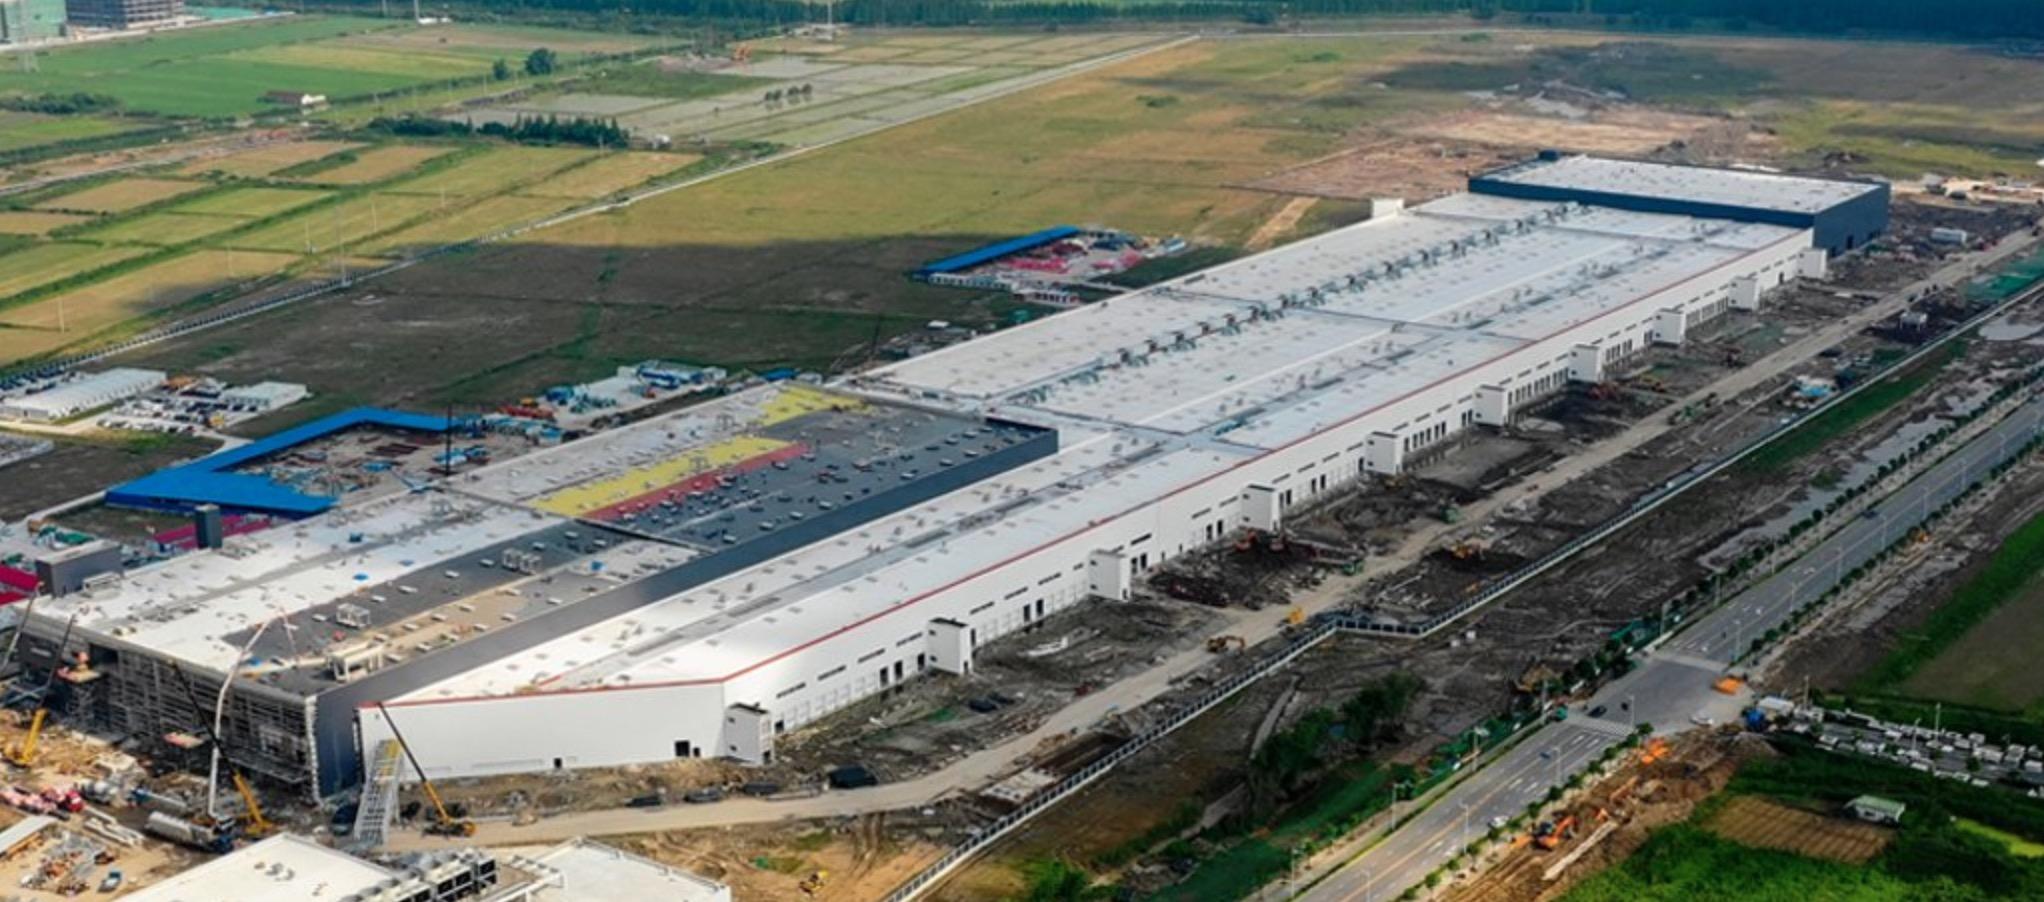 Tesla gets govt green light to start Model 3 production at Gigafactory 3 - Electrek